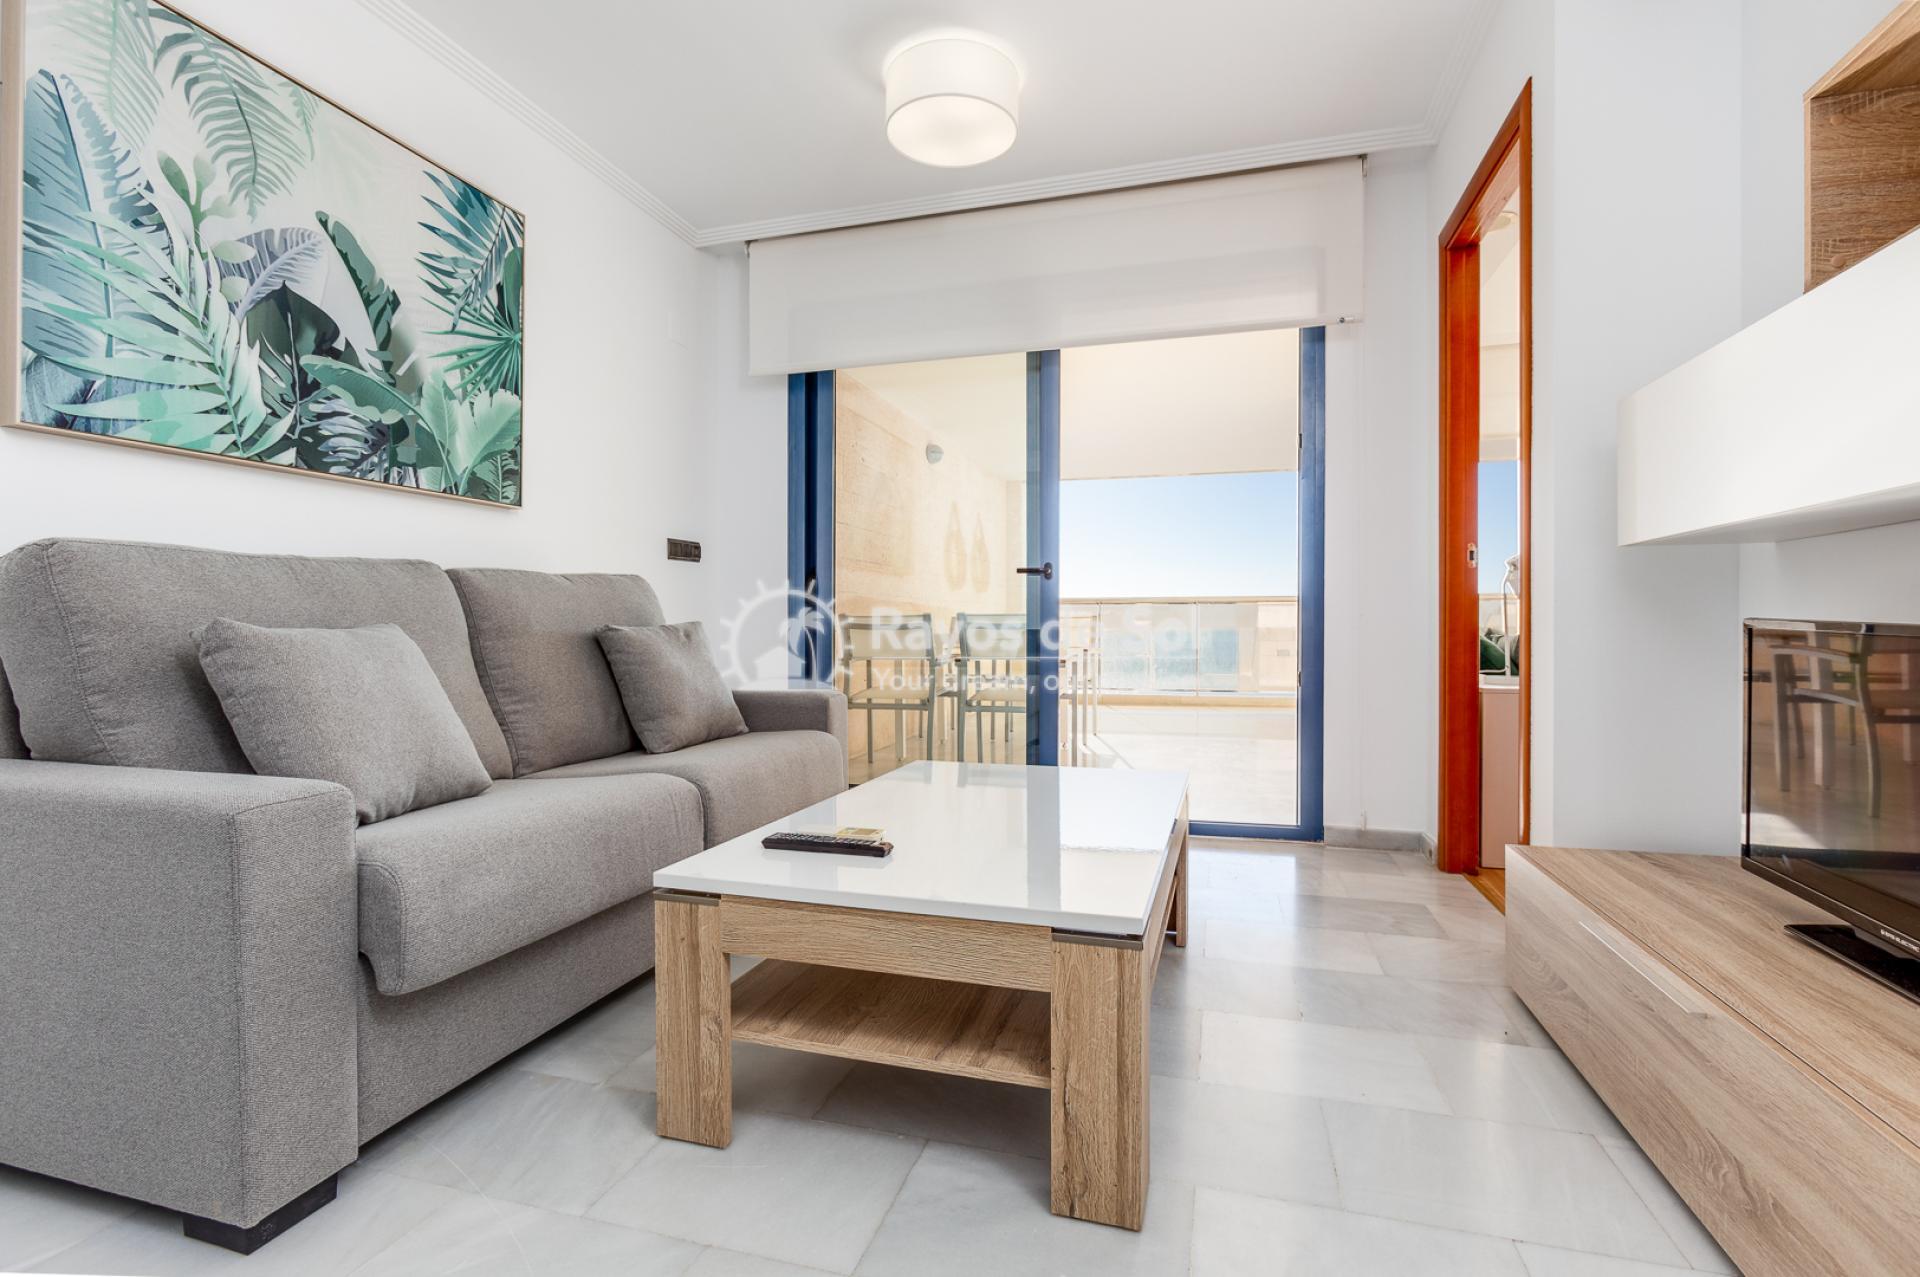 Turnekey first line apartments  in Altea, Costa Blanca (Alteabeach) - 14